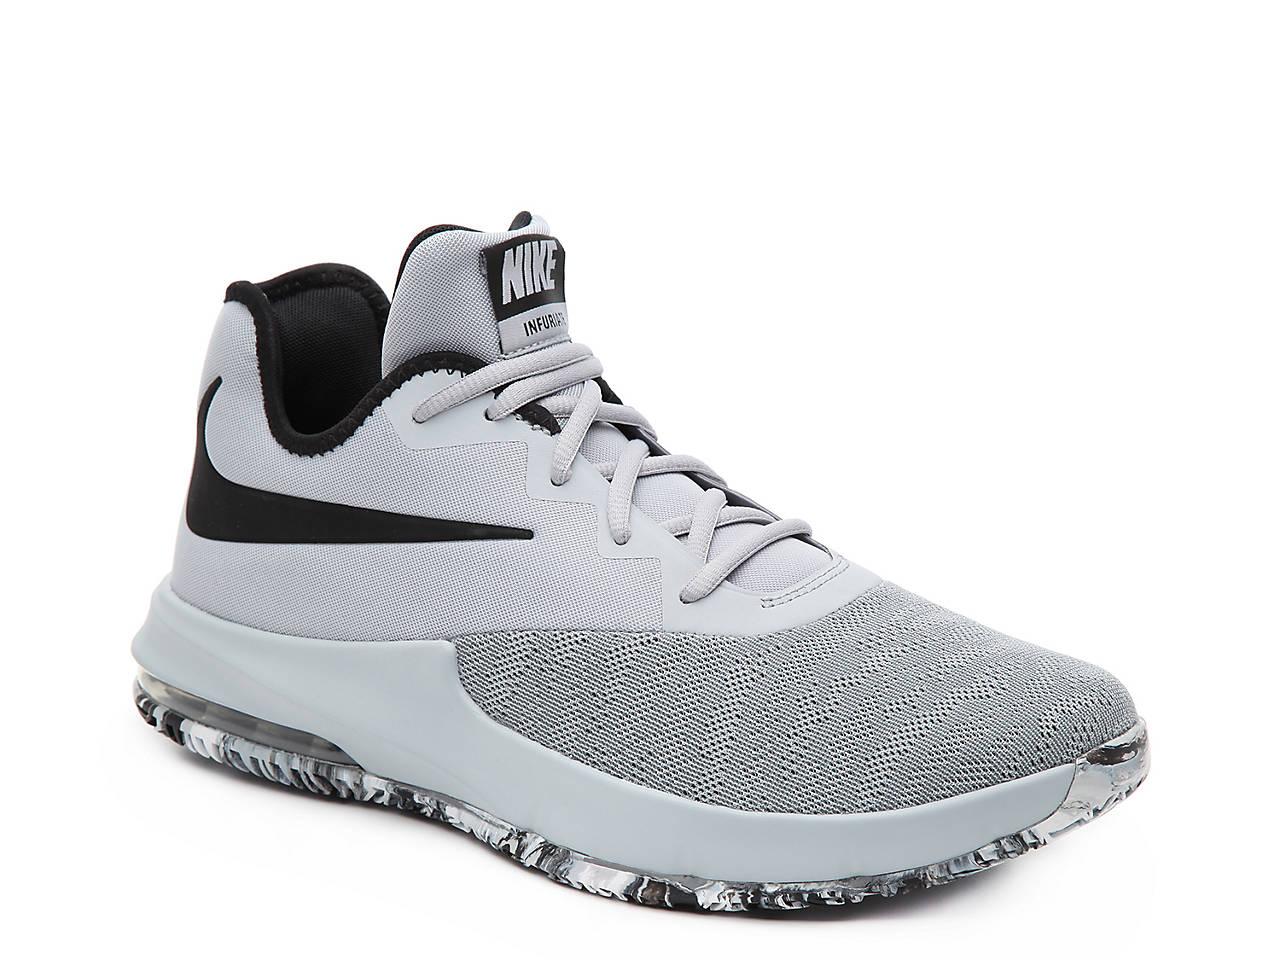 prix compétitif 2555b 1a940 Air Max Infuriate 3 Basketball Shoe - Men's